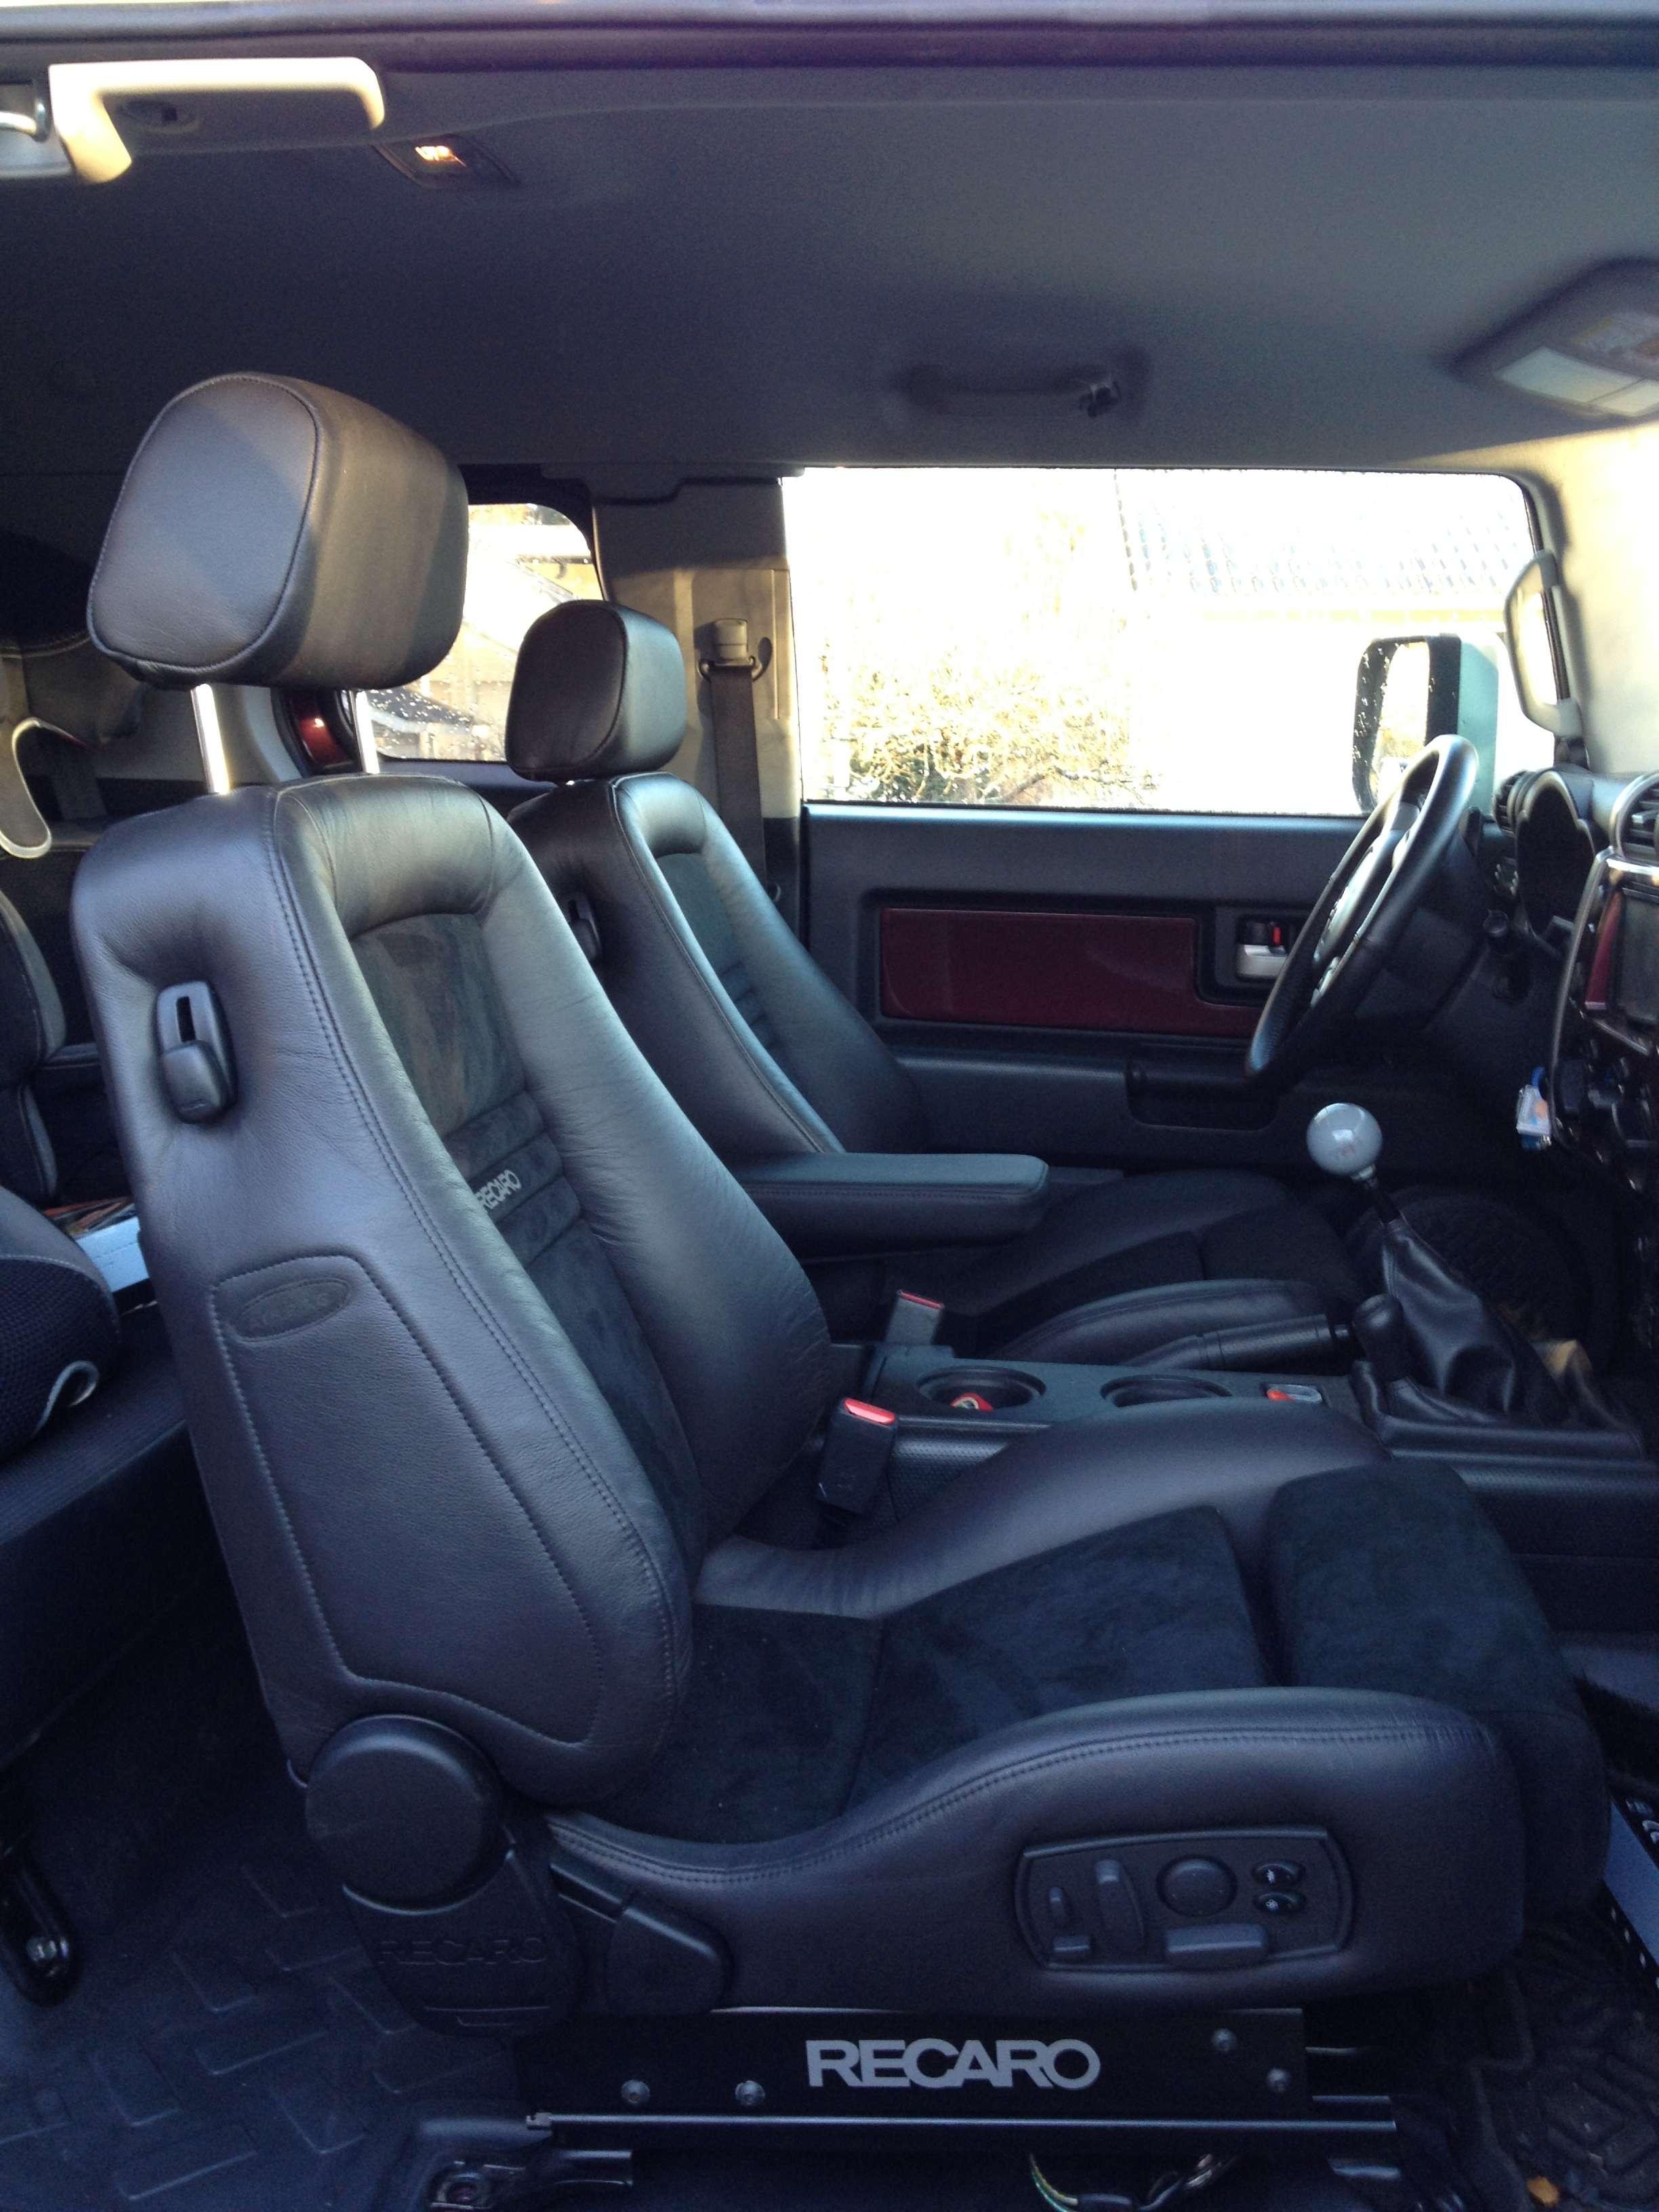 Used Fj Cruiser >> Recaro seats - Page 8 - Toyota FJ Cruiser Forum